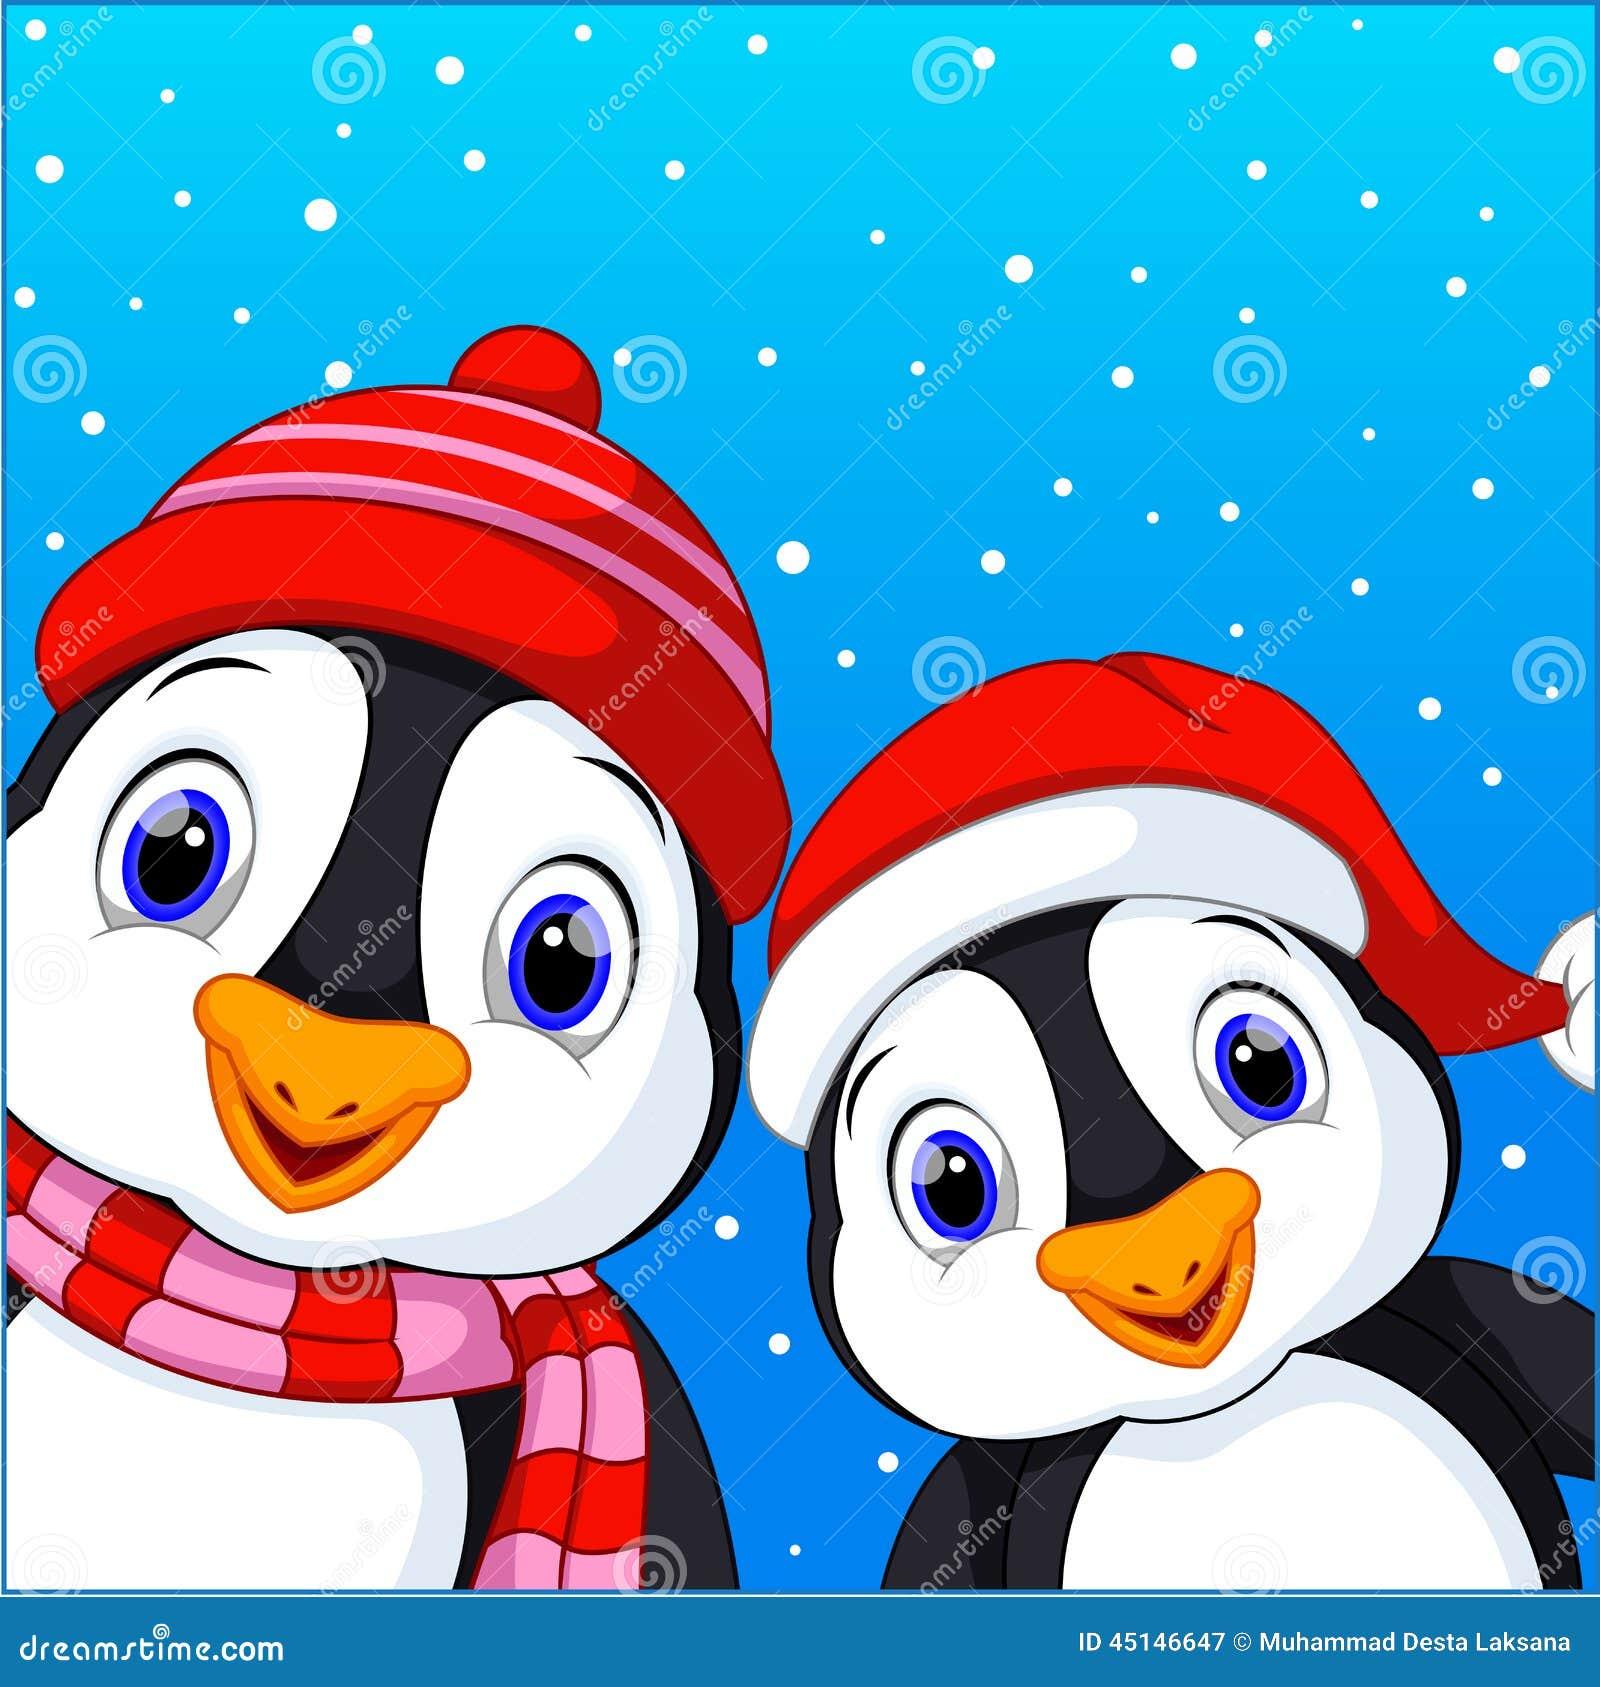 Cute Penguins Cartoon Stock Illustration - Image: 45146647